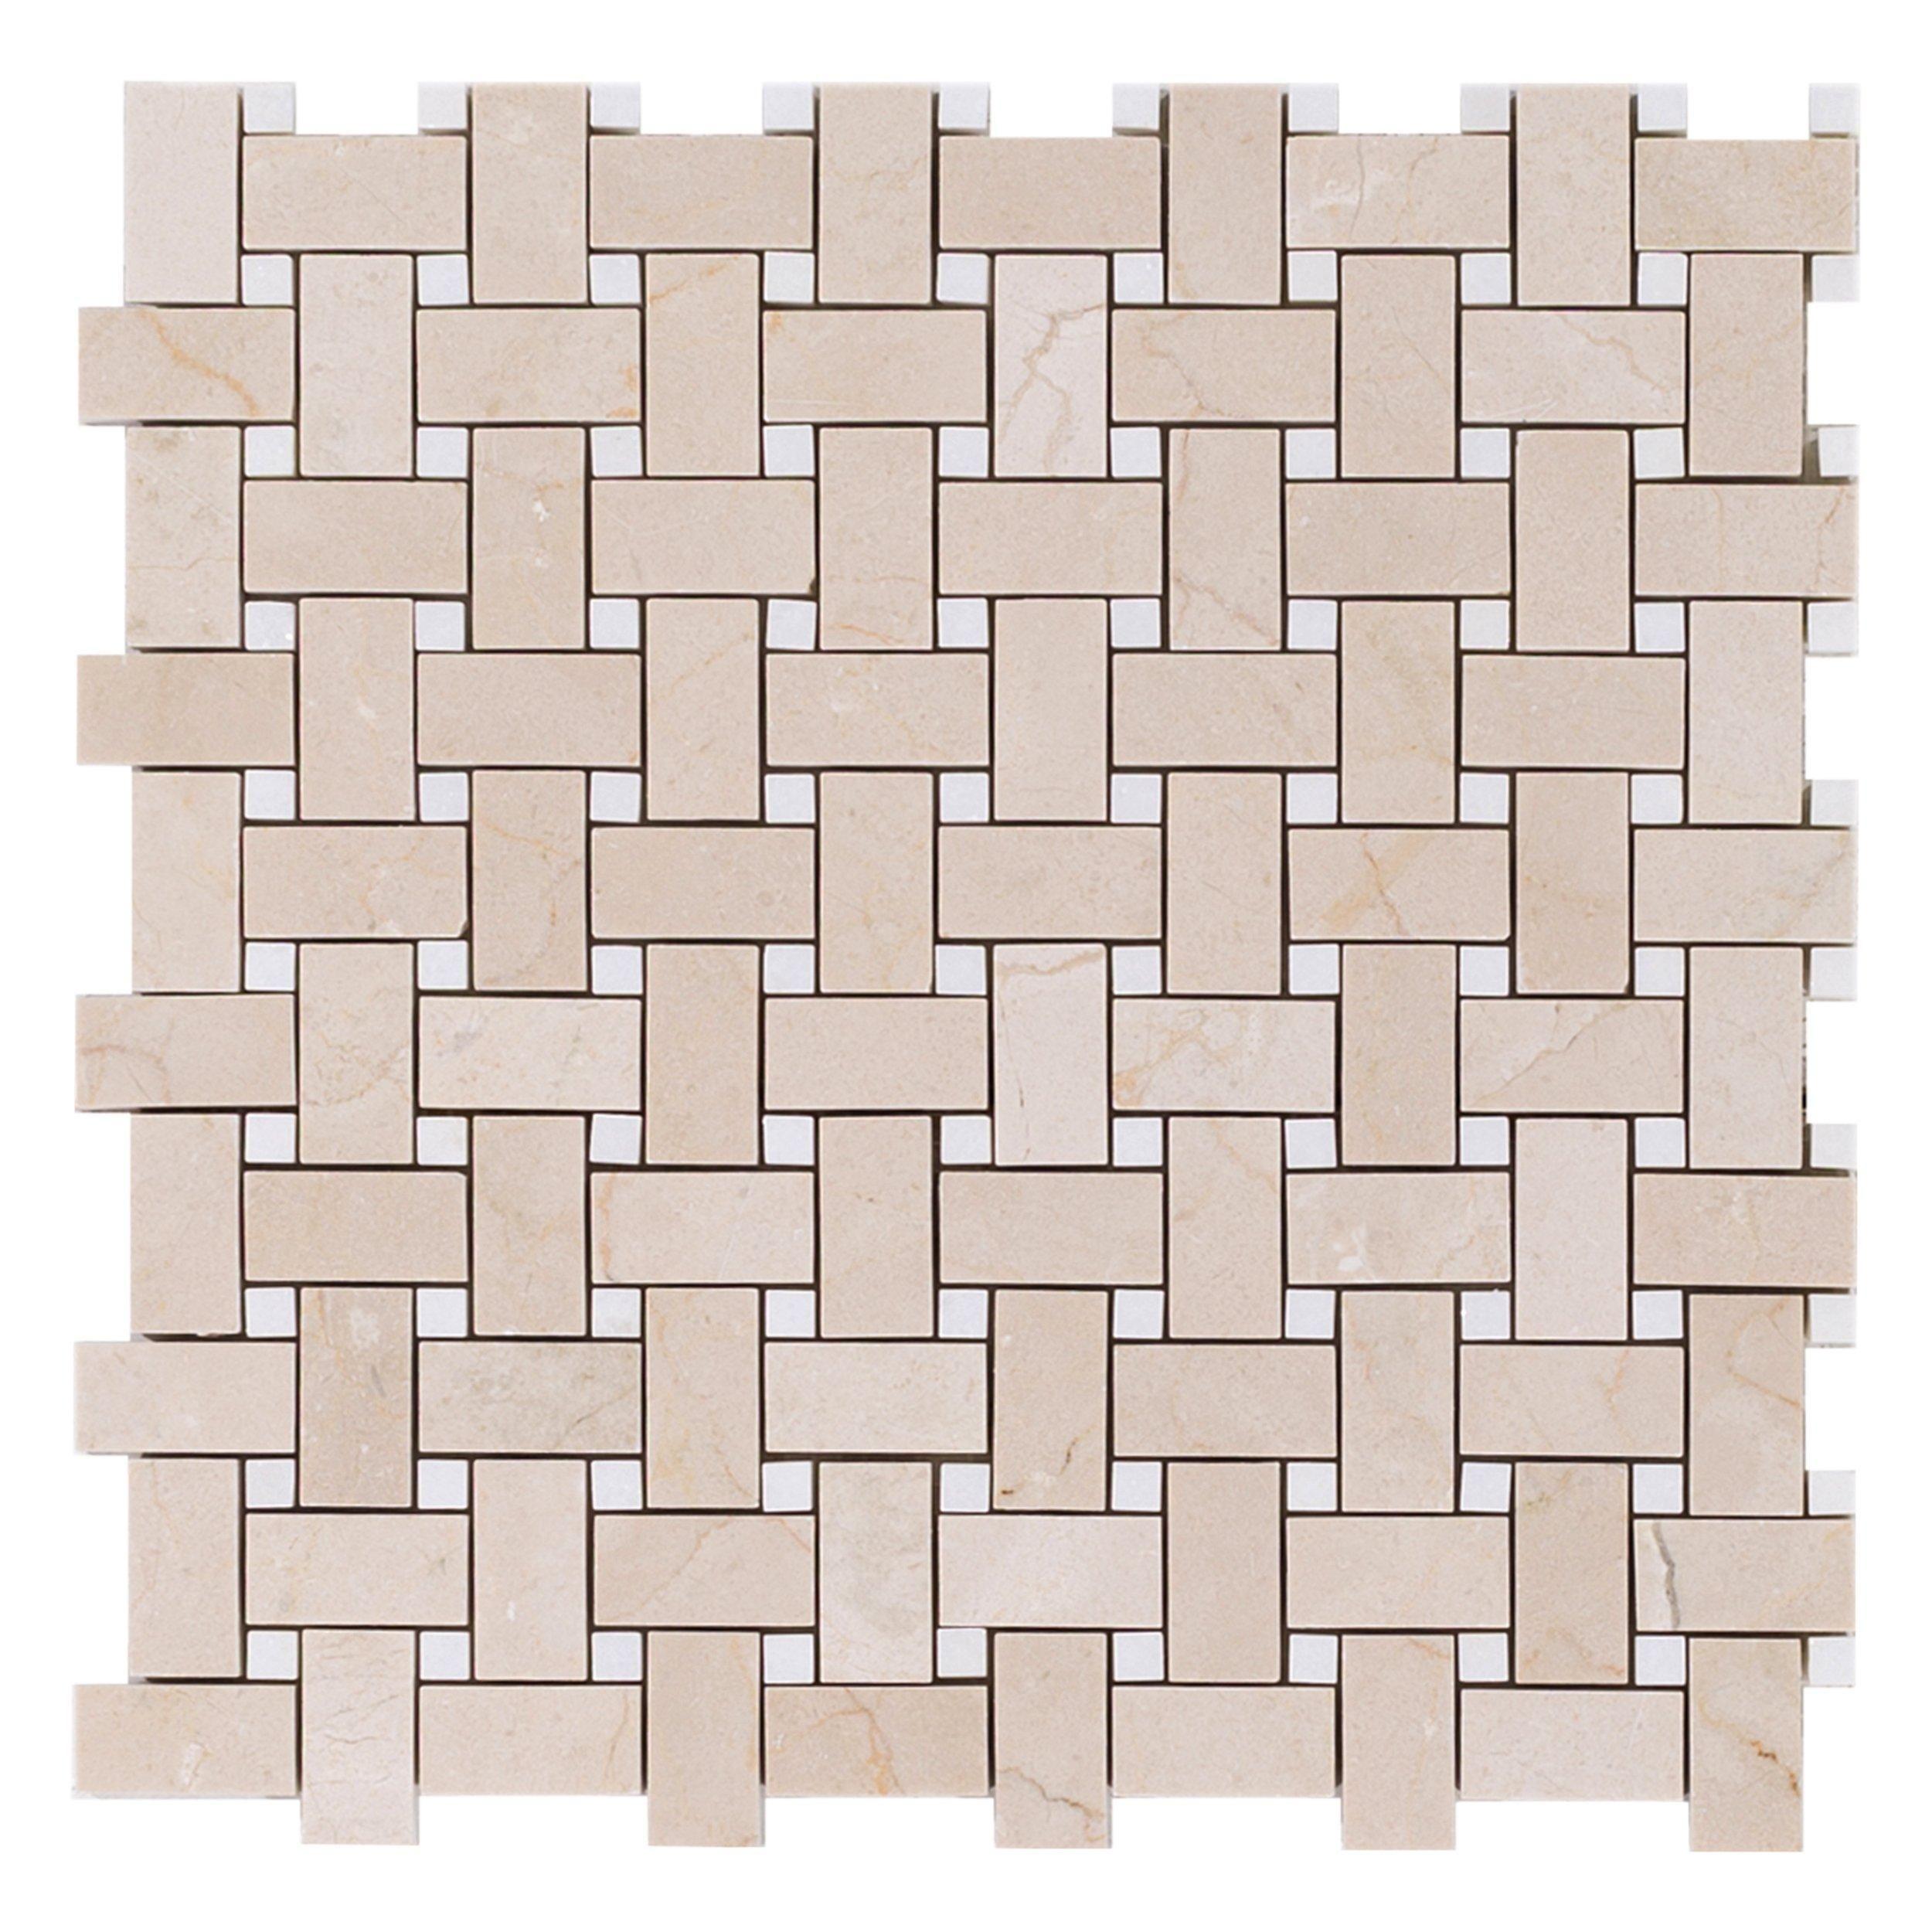 Stone Wall Accent Crema Marfil Floor: Crema Marfil Basketweave Marble Mosaic